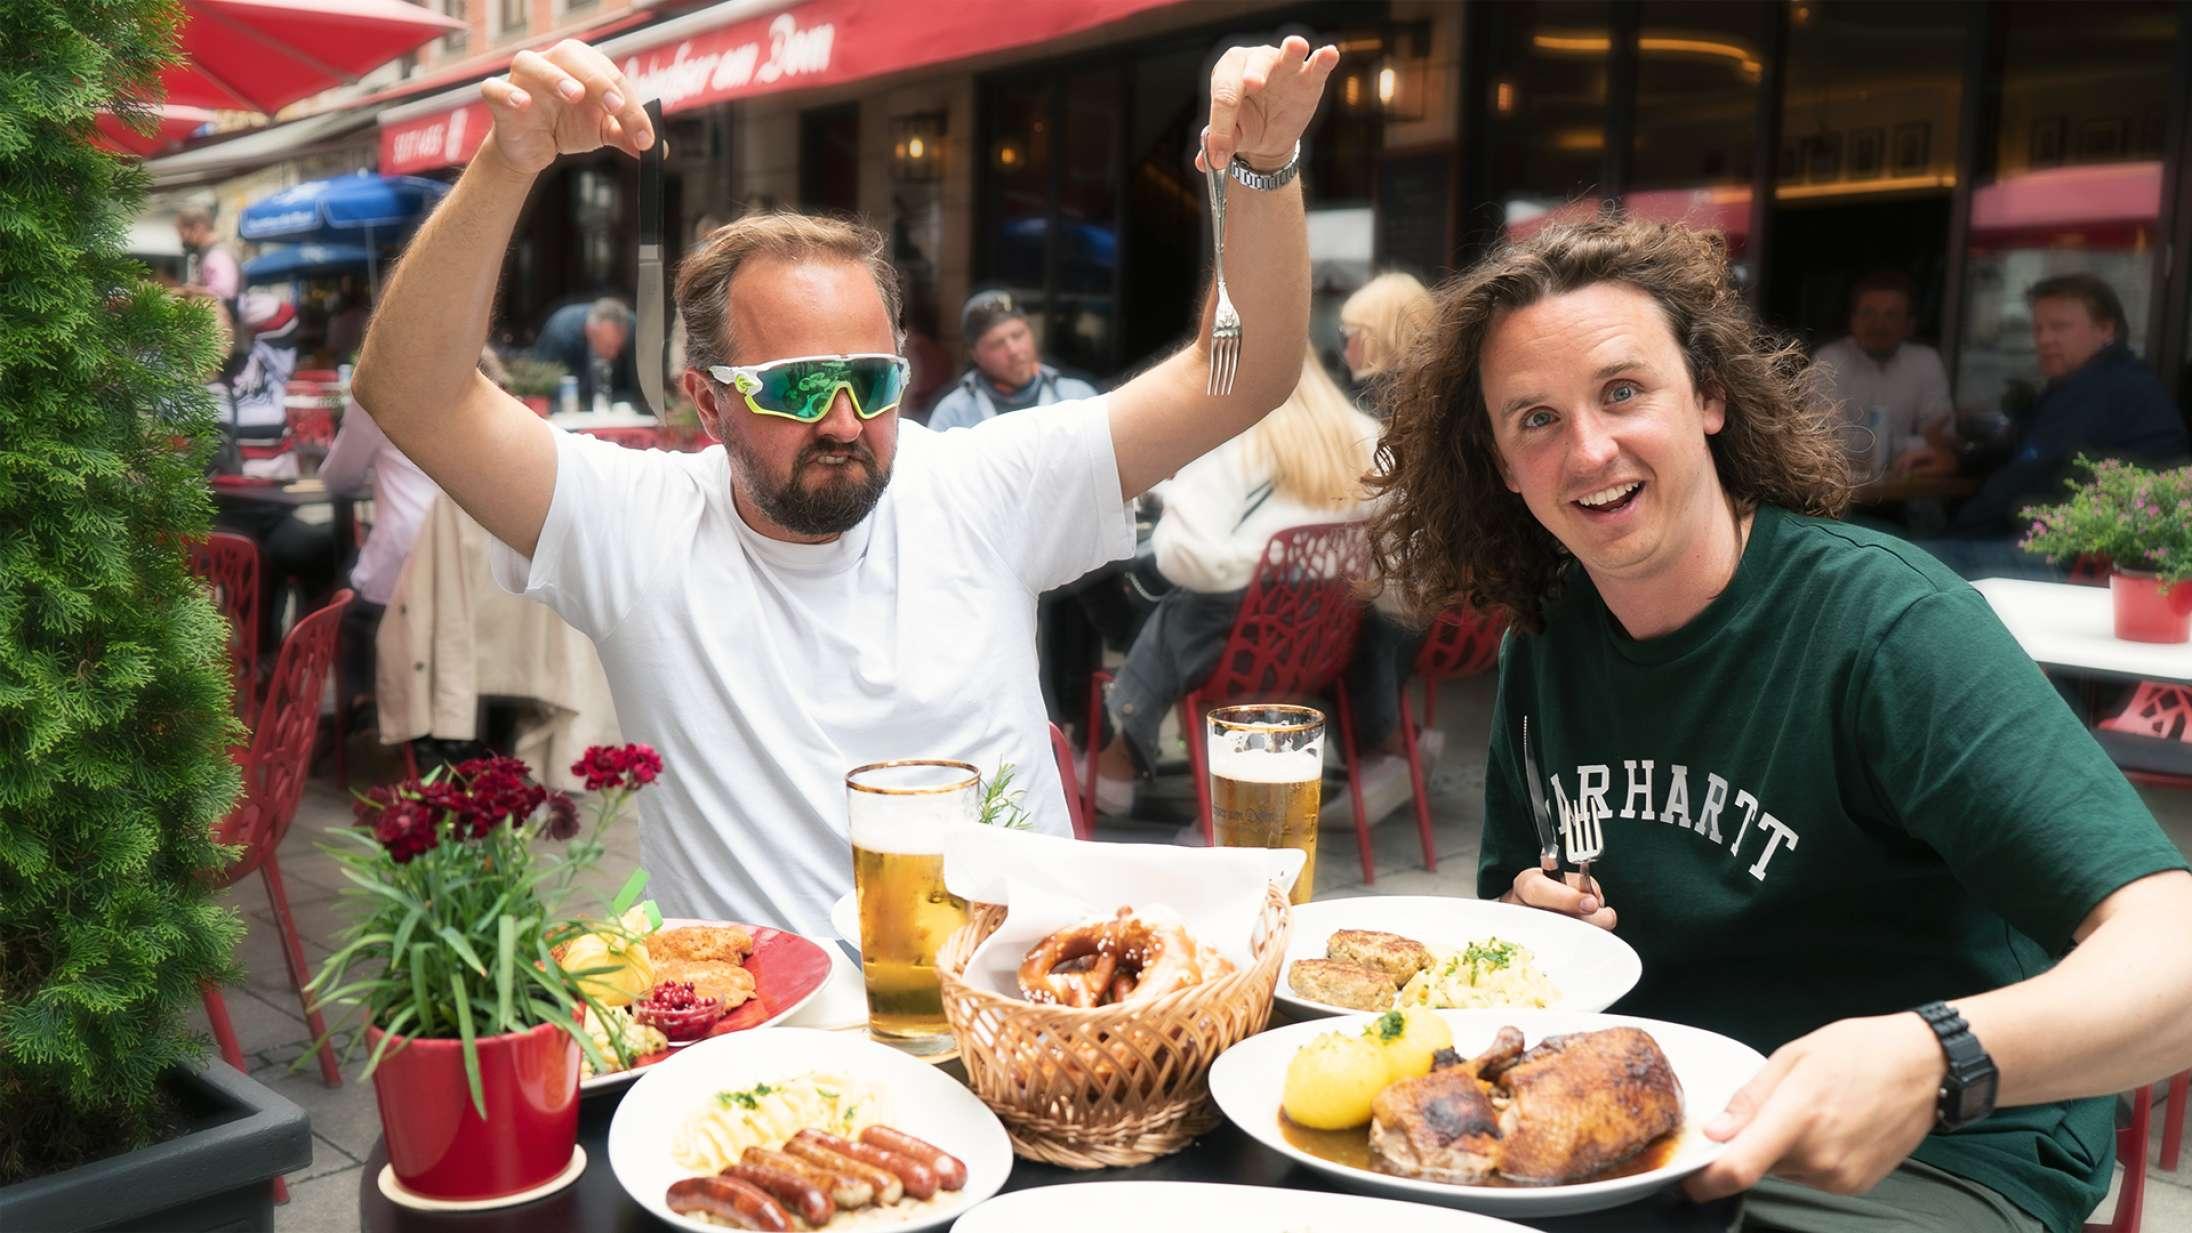 'Brødrene Ost': Millang-brødrenes rejseserie på TV 2 er fornøjelig og overfladisk